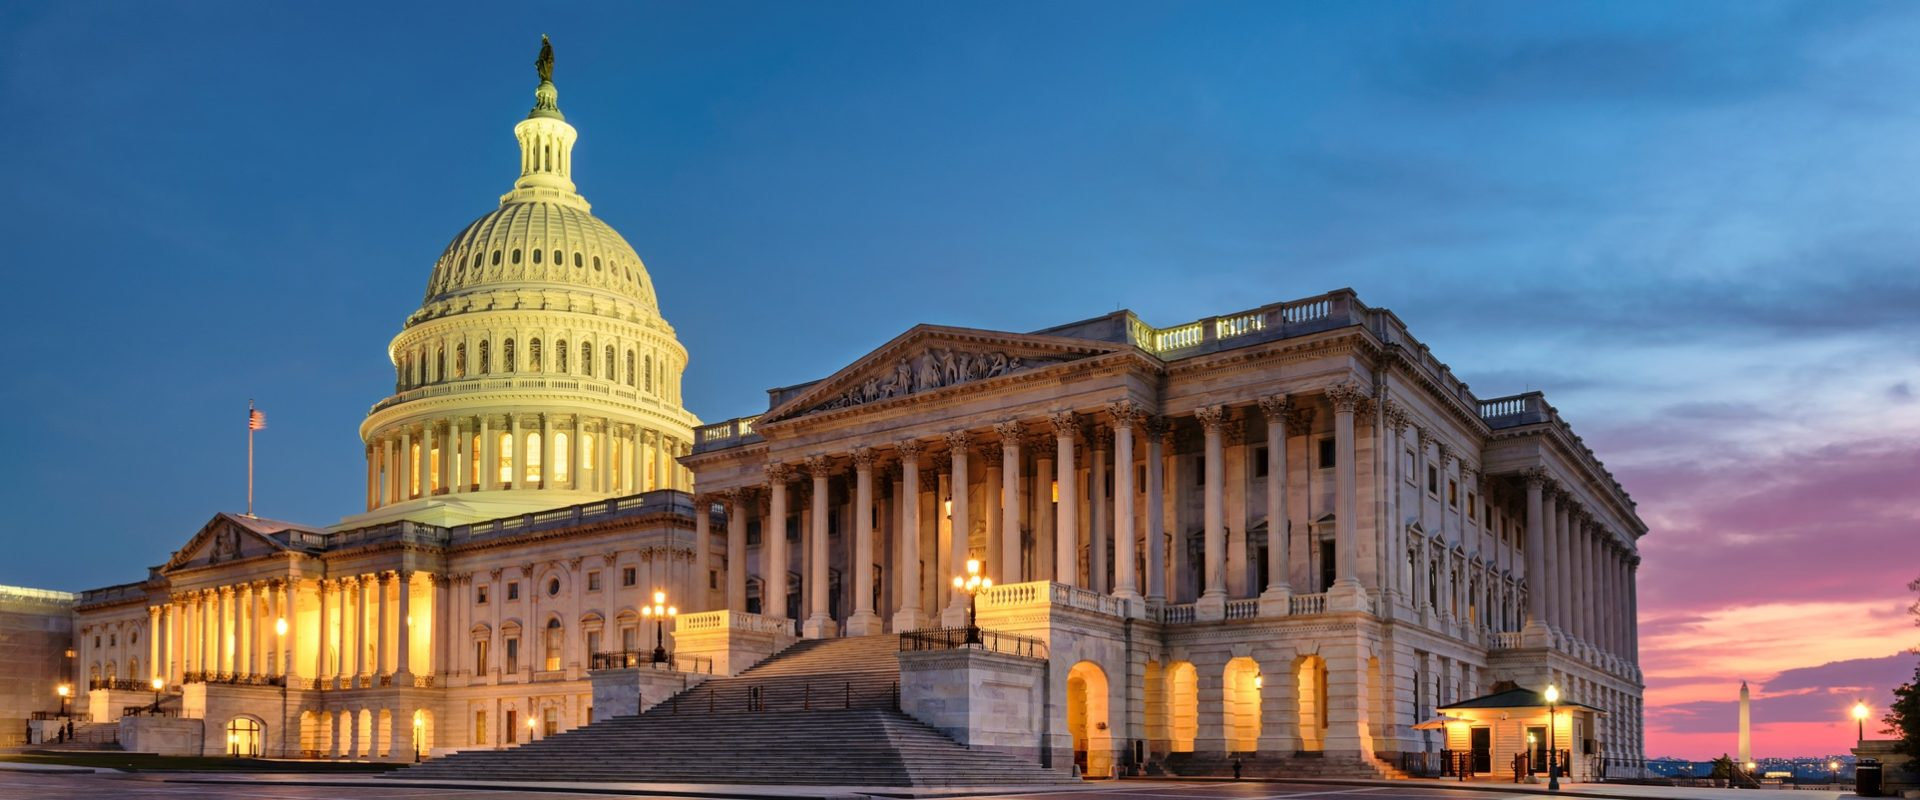 SEC: Washington, D.C.